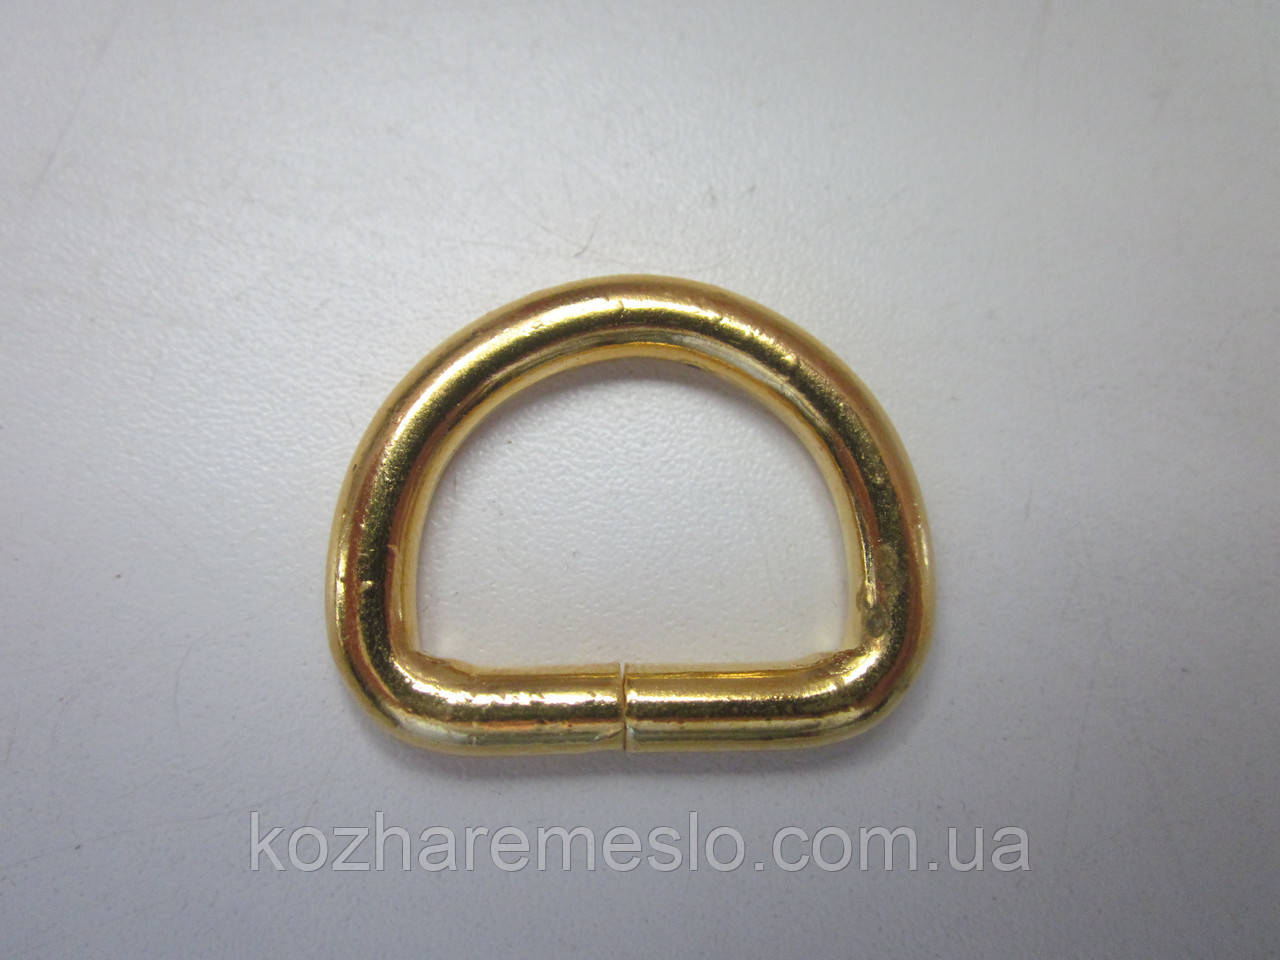 Полукольцо 4 х 25  х 17 мм золото